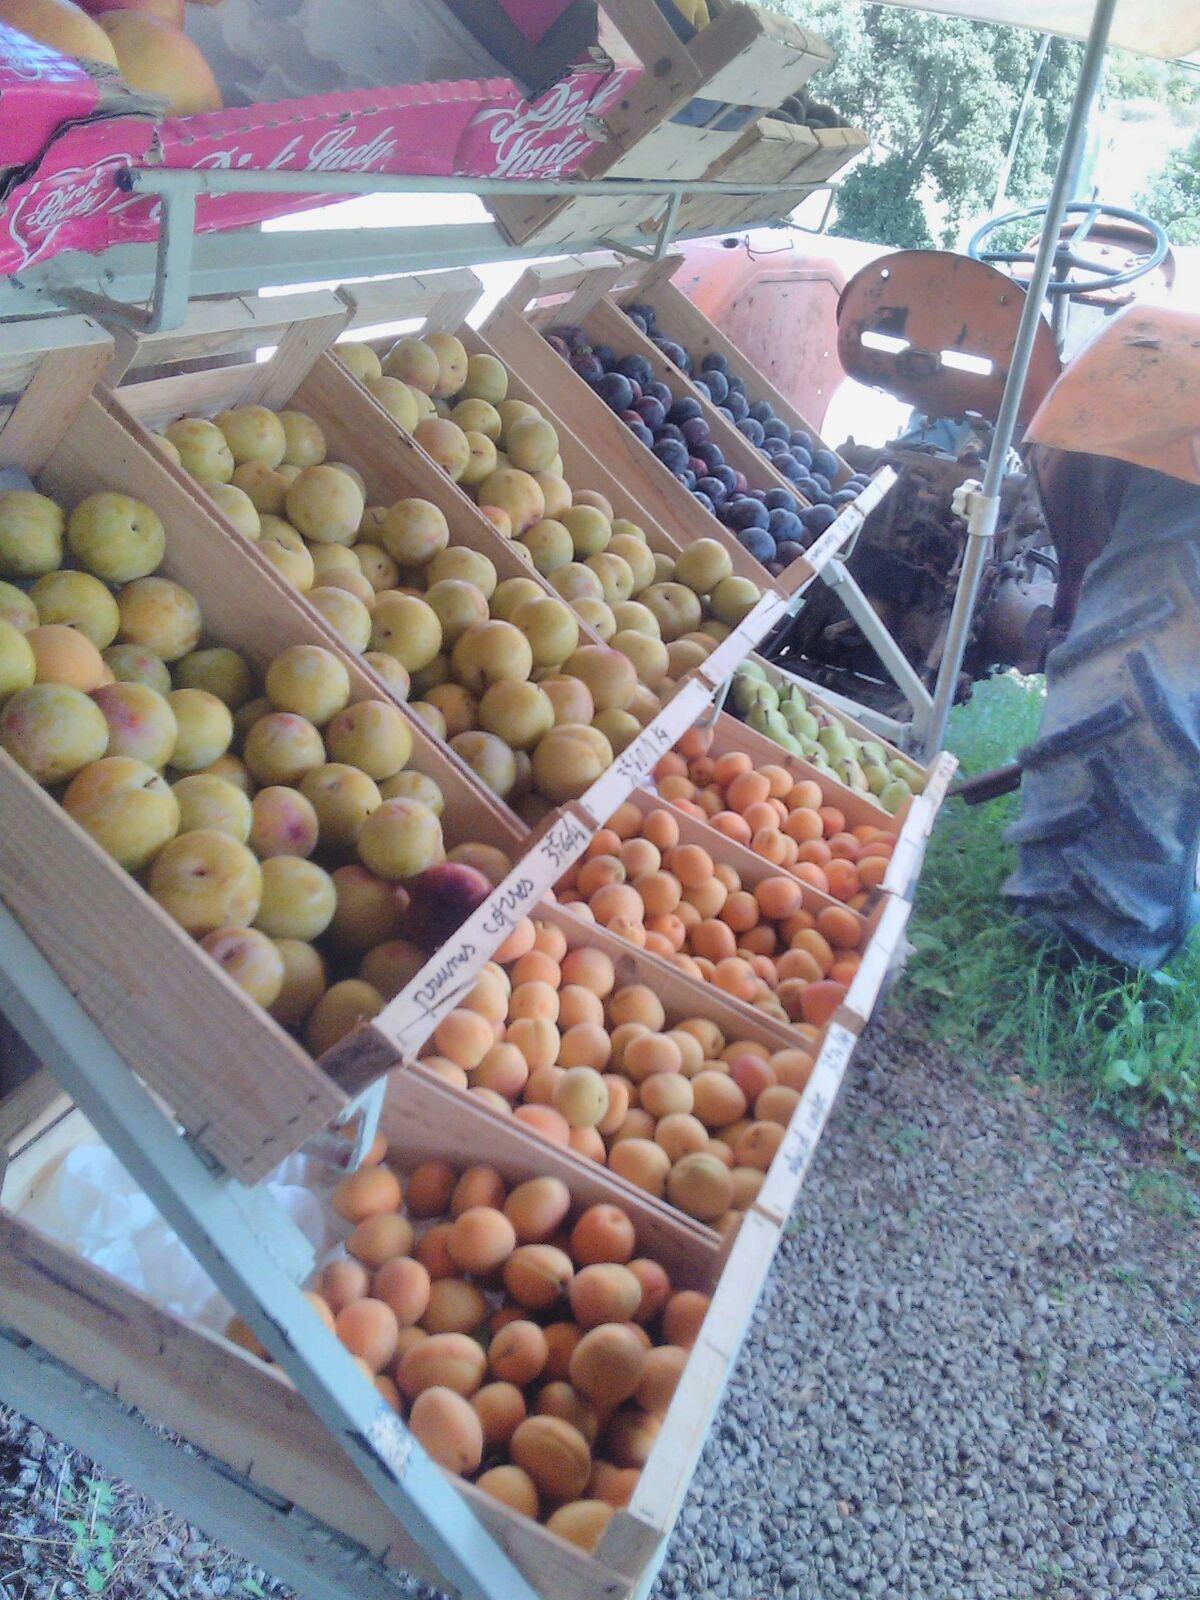 Fruits et legumes corses